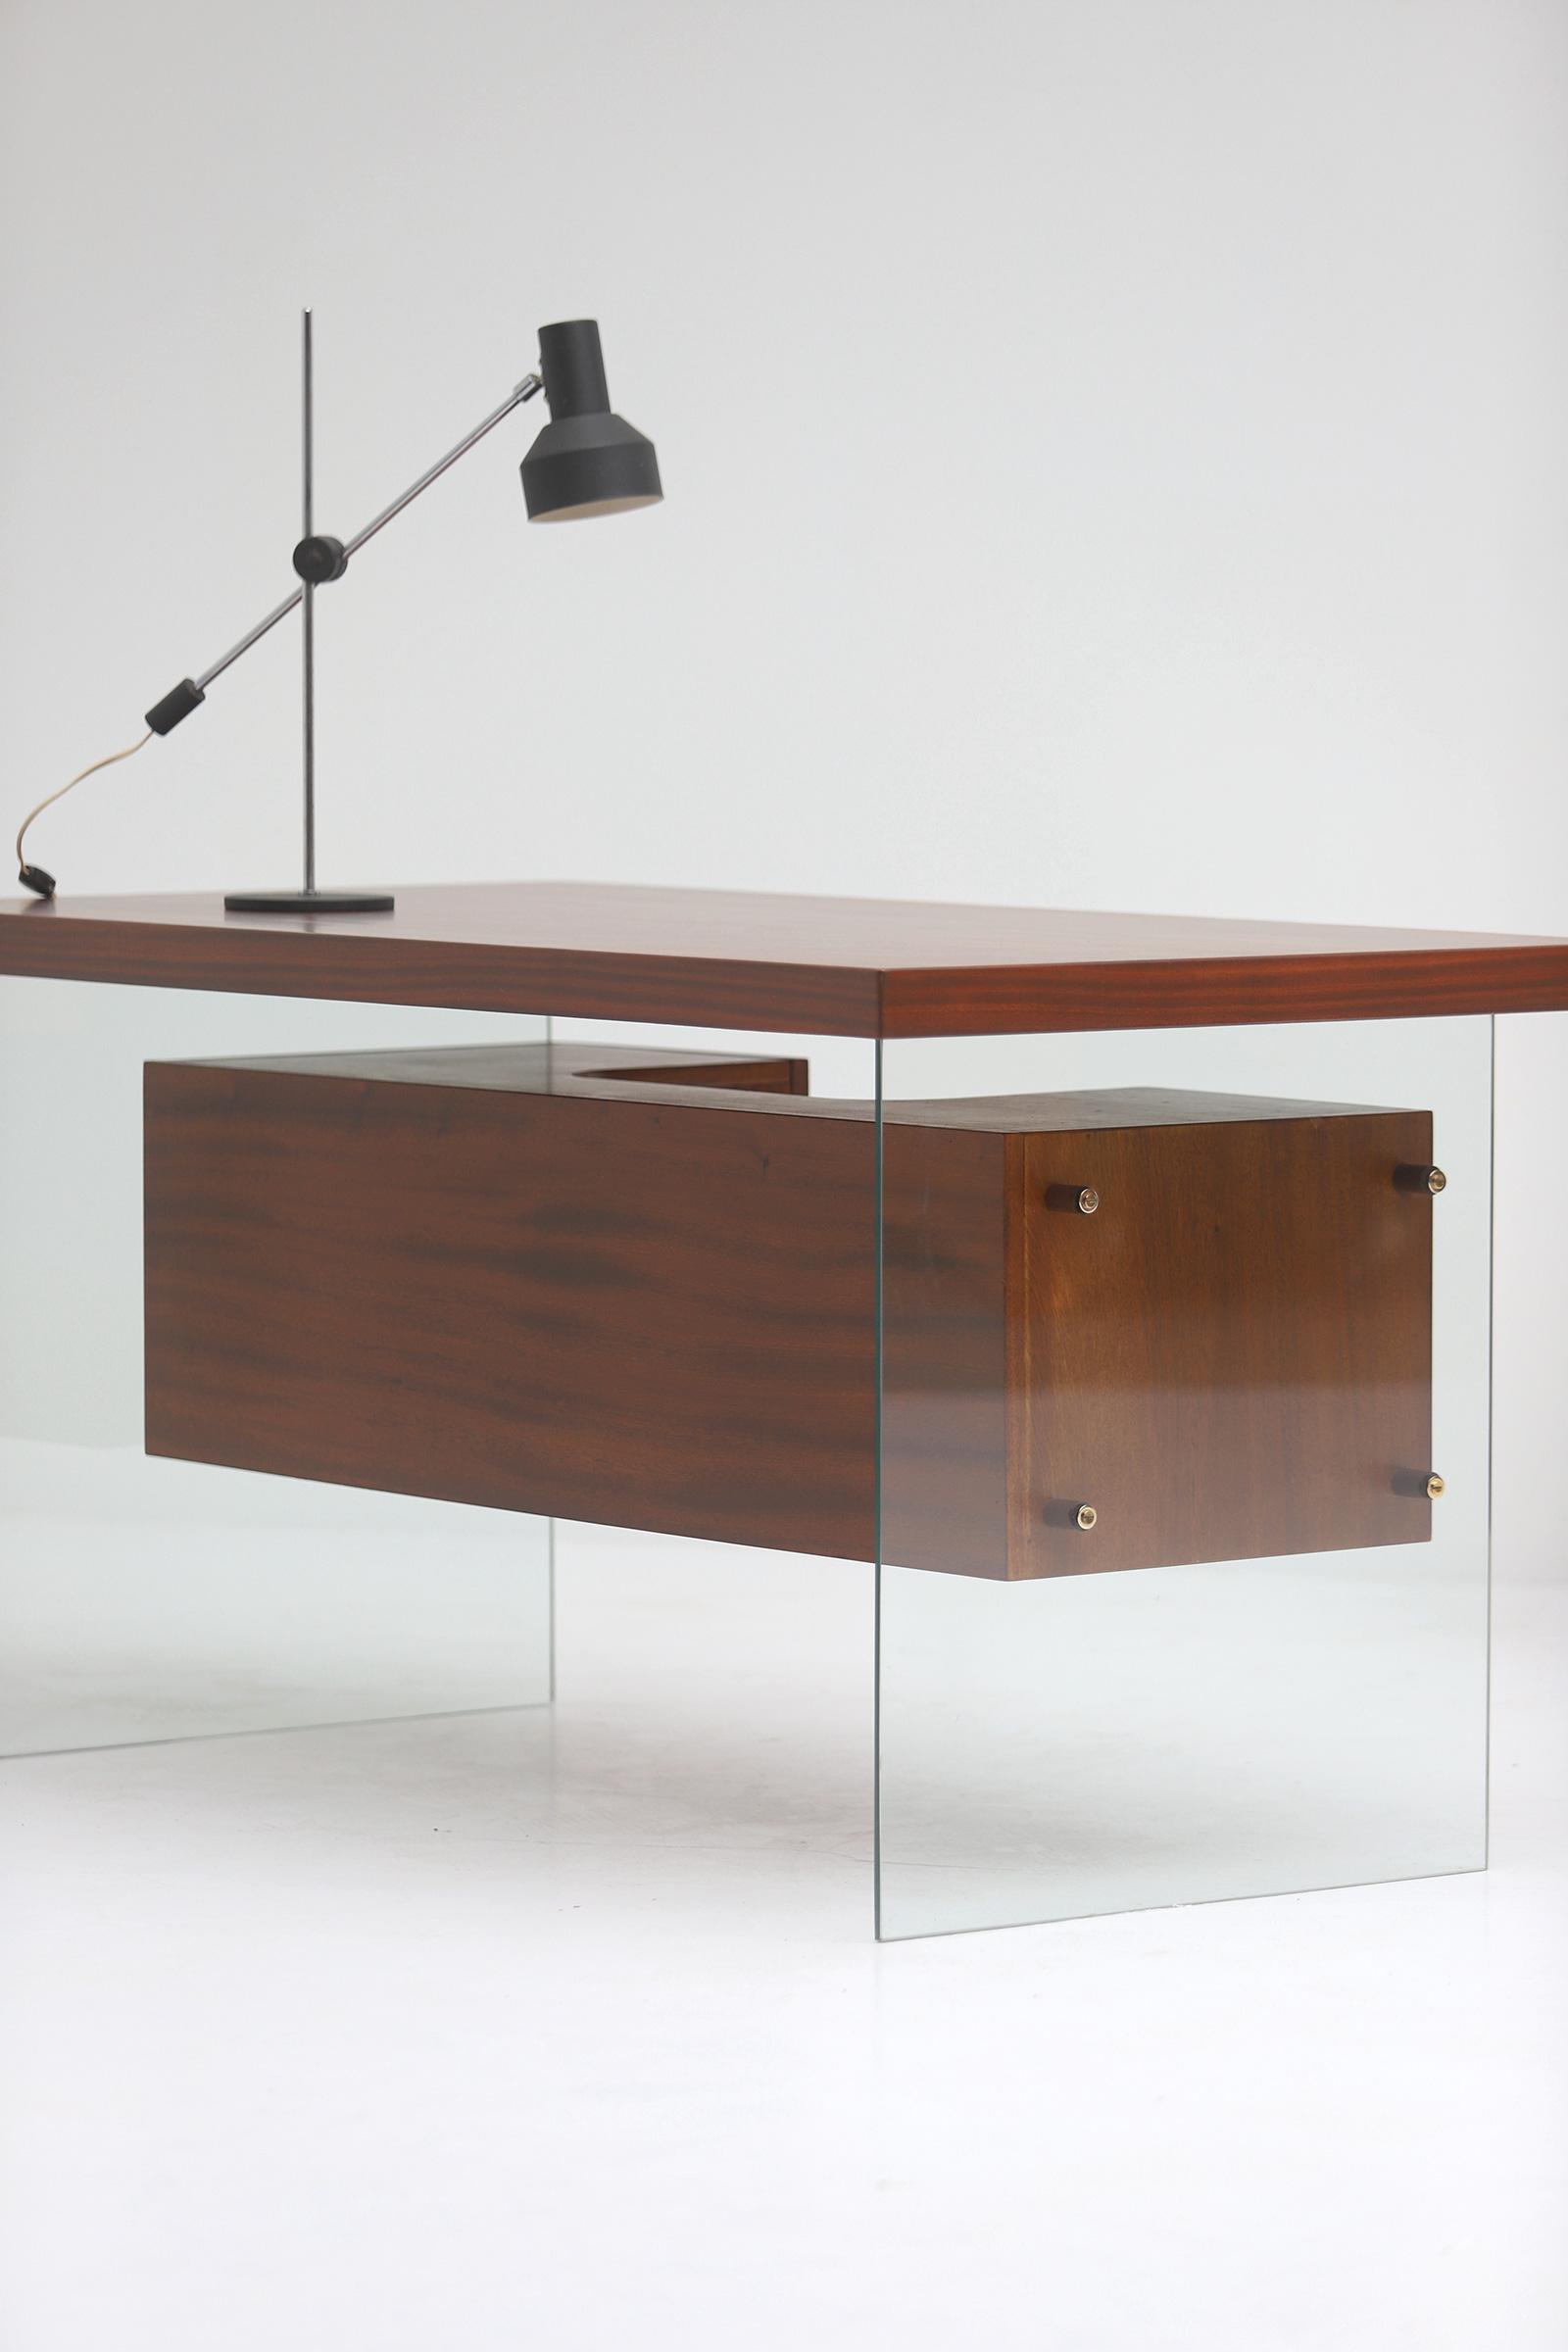 Modernist desk in the manner of Jacques Dumond, 1950simage 3